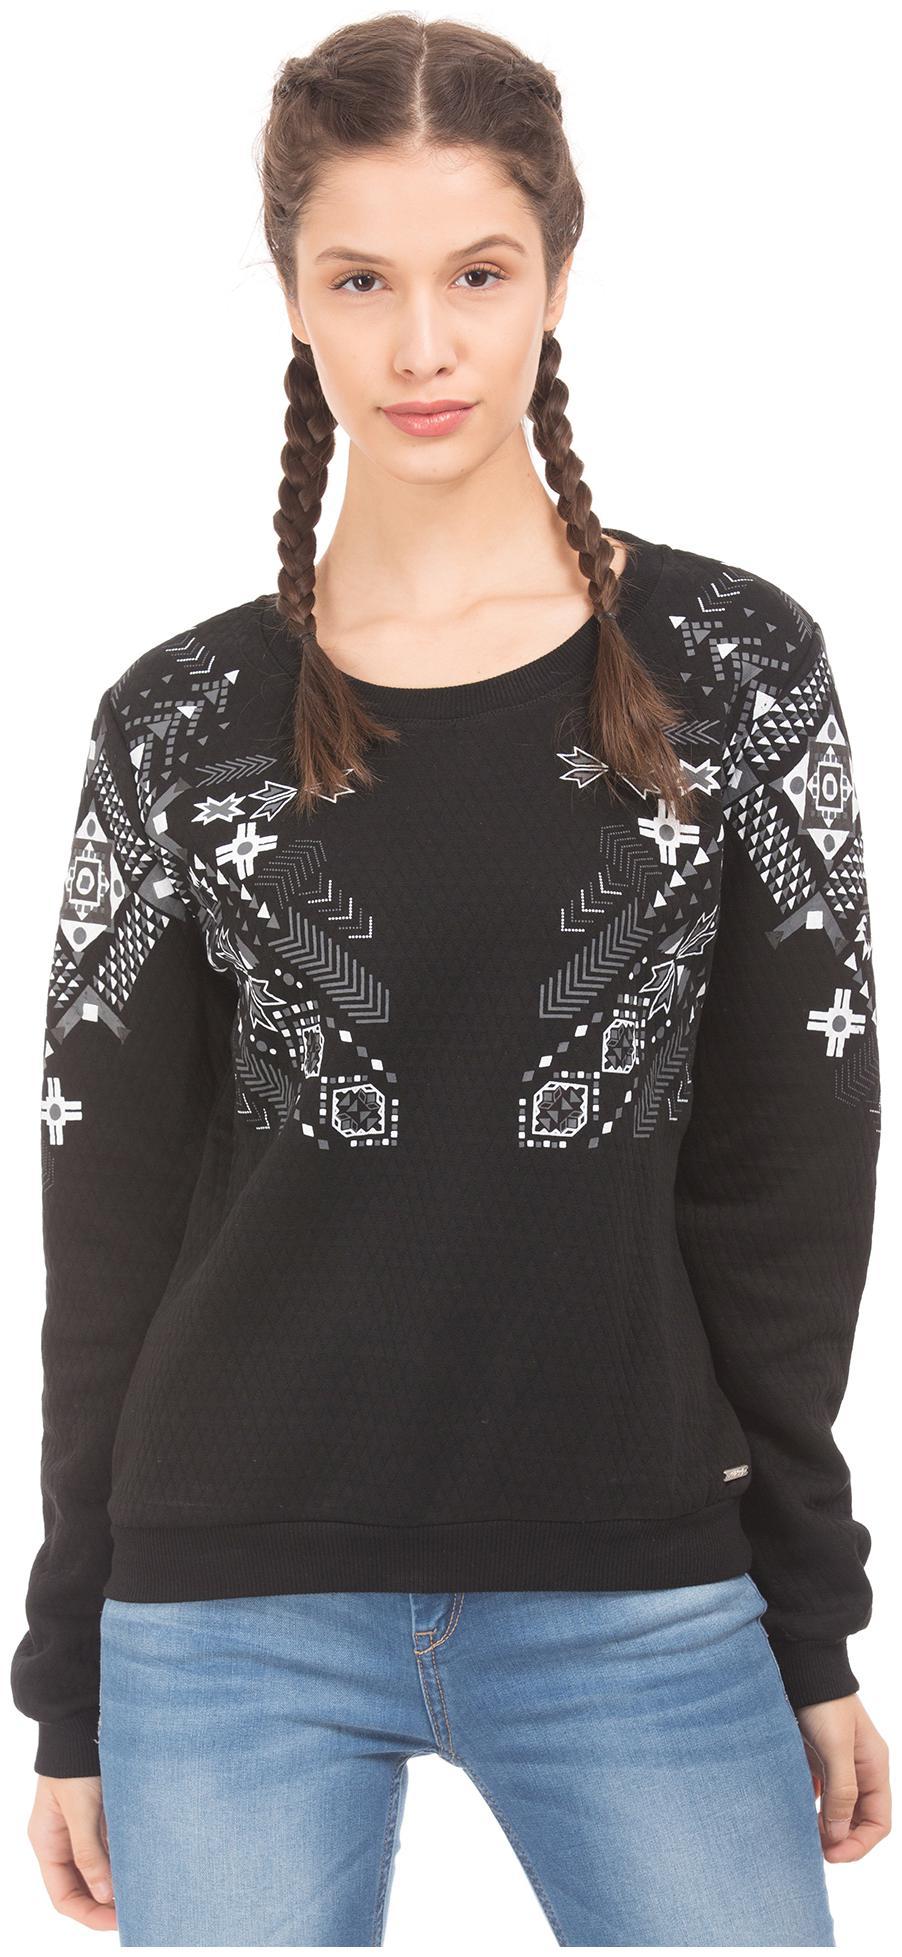 ED Hardy Women Printed Sweatshirt   Black